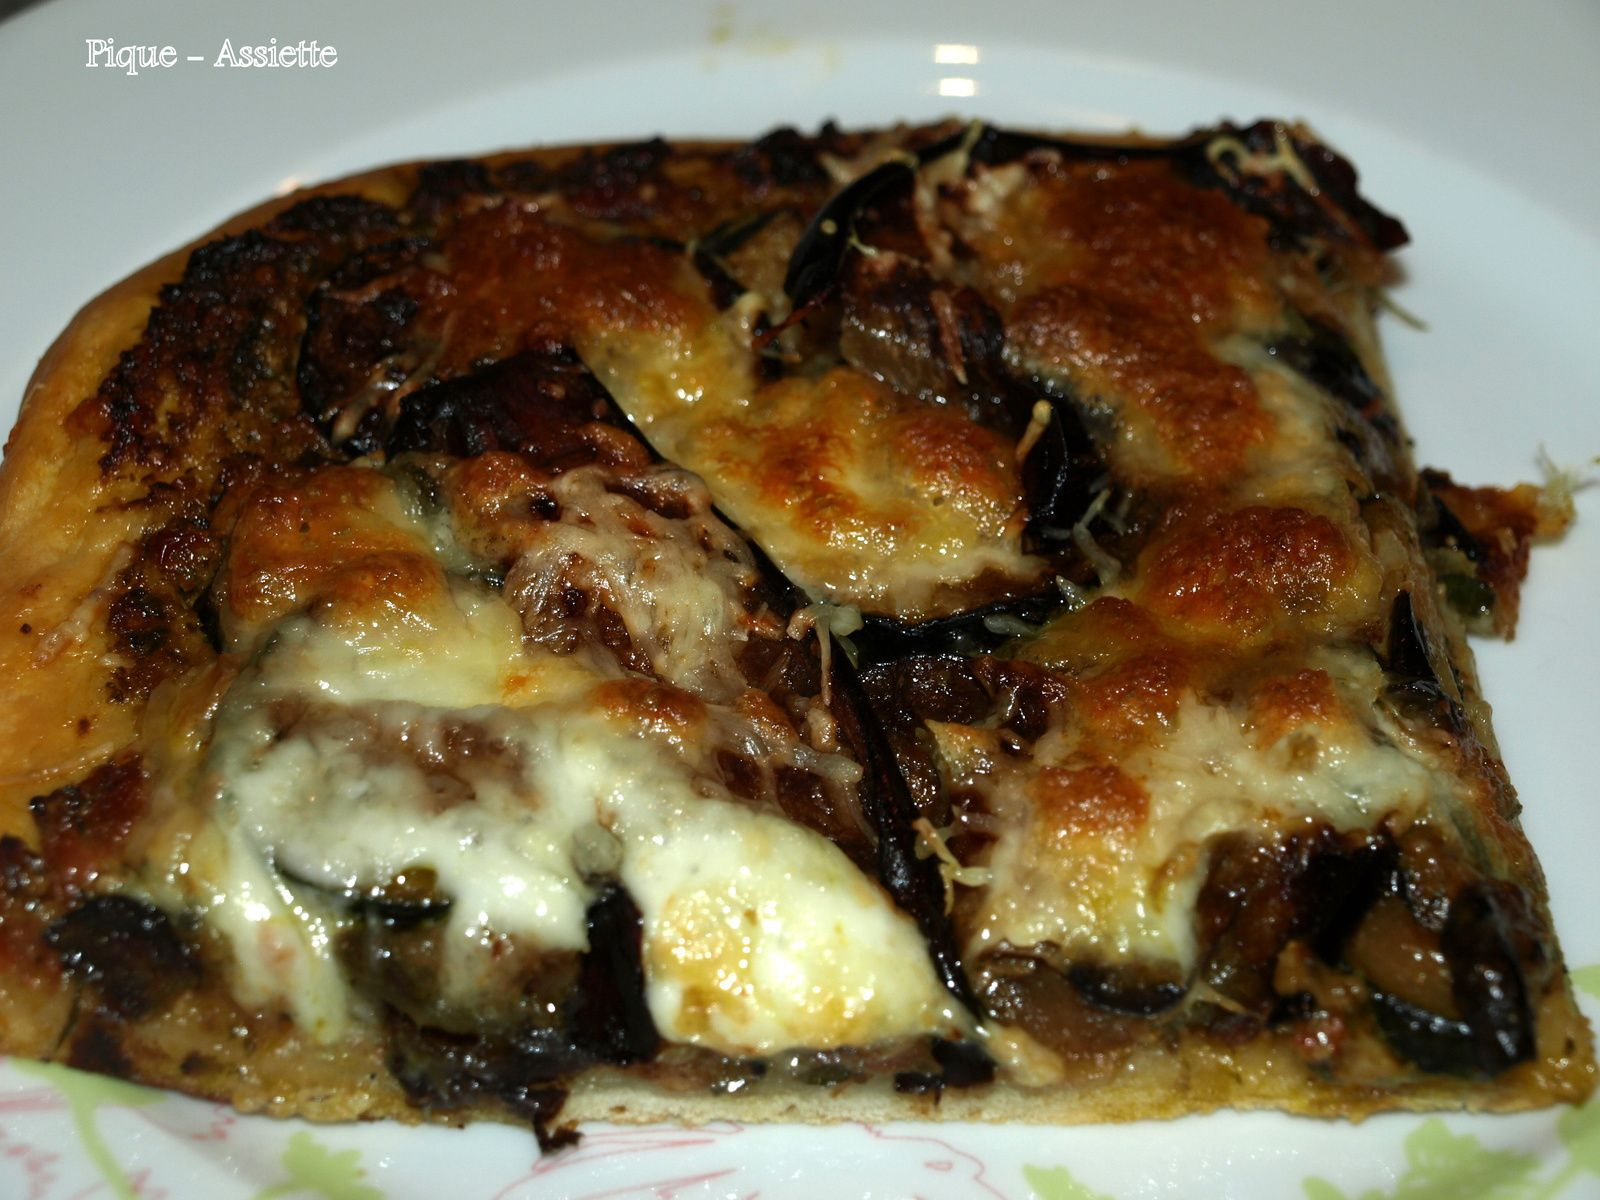 Pizza au pesto rosso, courgettes et aubergines.